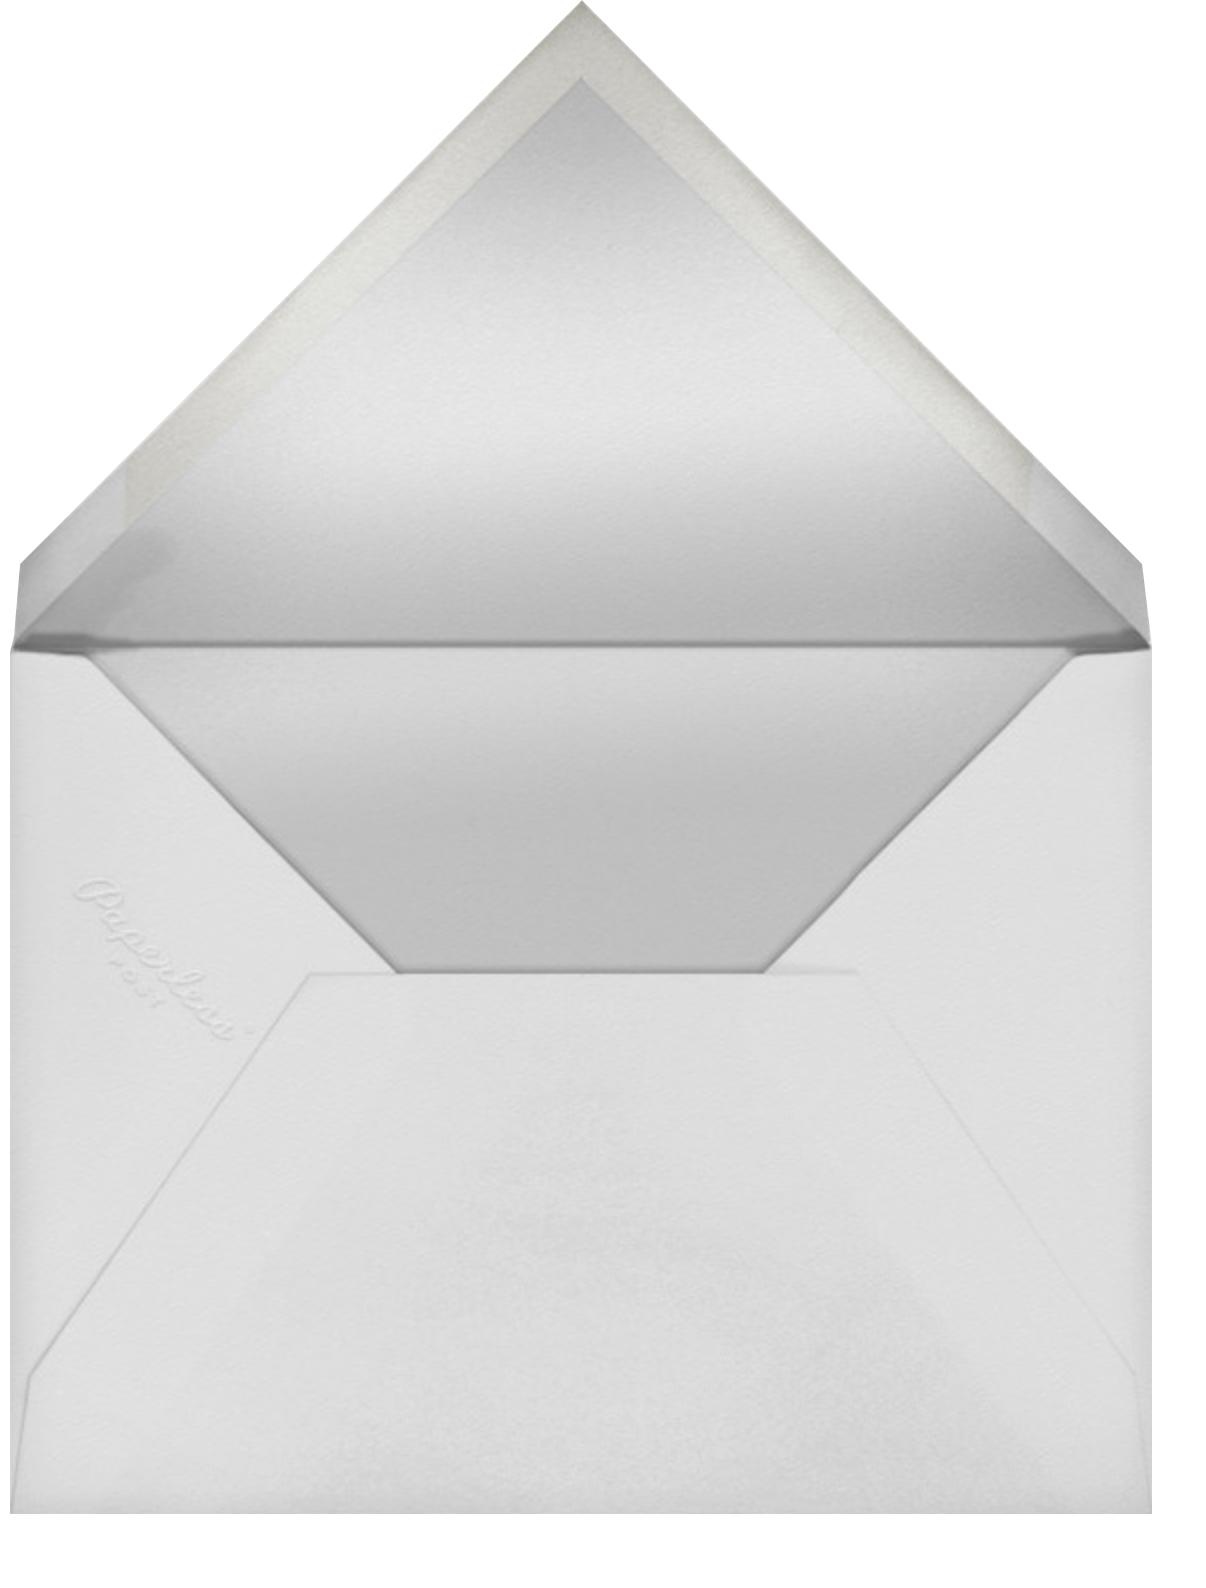 Hot Stuff - Paperless Post - Flirty valentines - envelope back